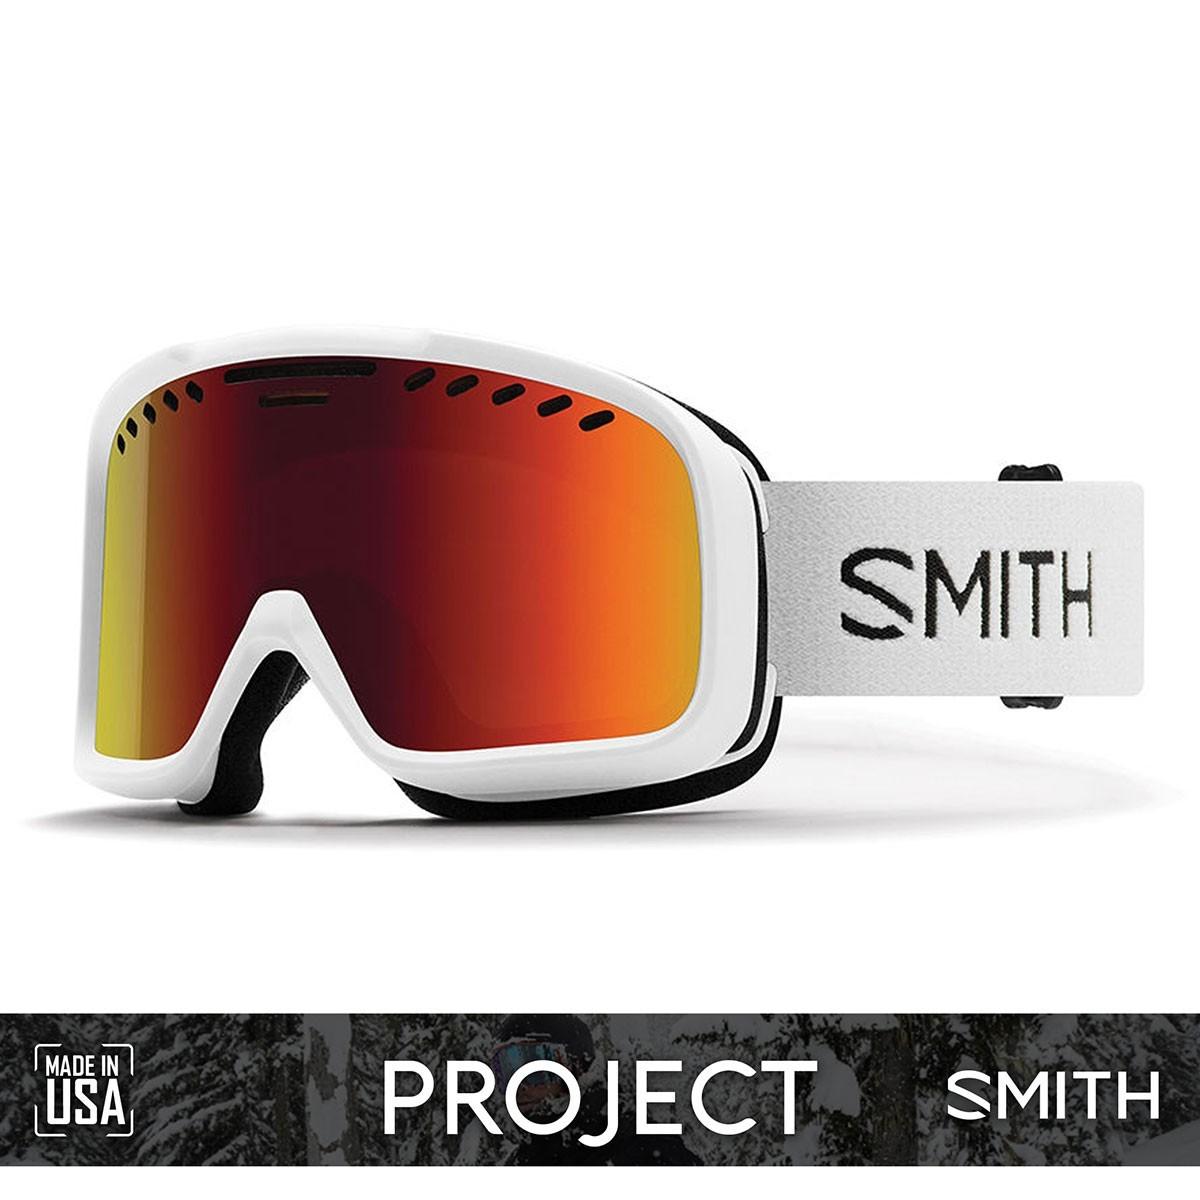 SMITH PROJECT White   S3 RED SOL-X Mirror - Изображение - AQUAMATRIX